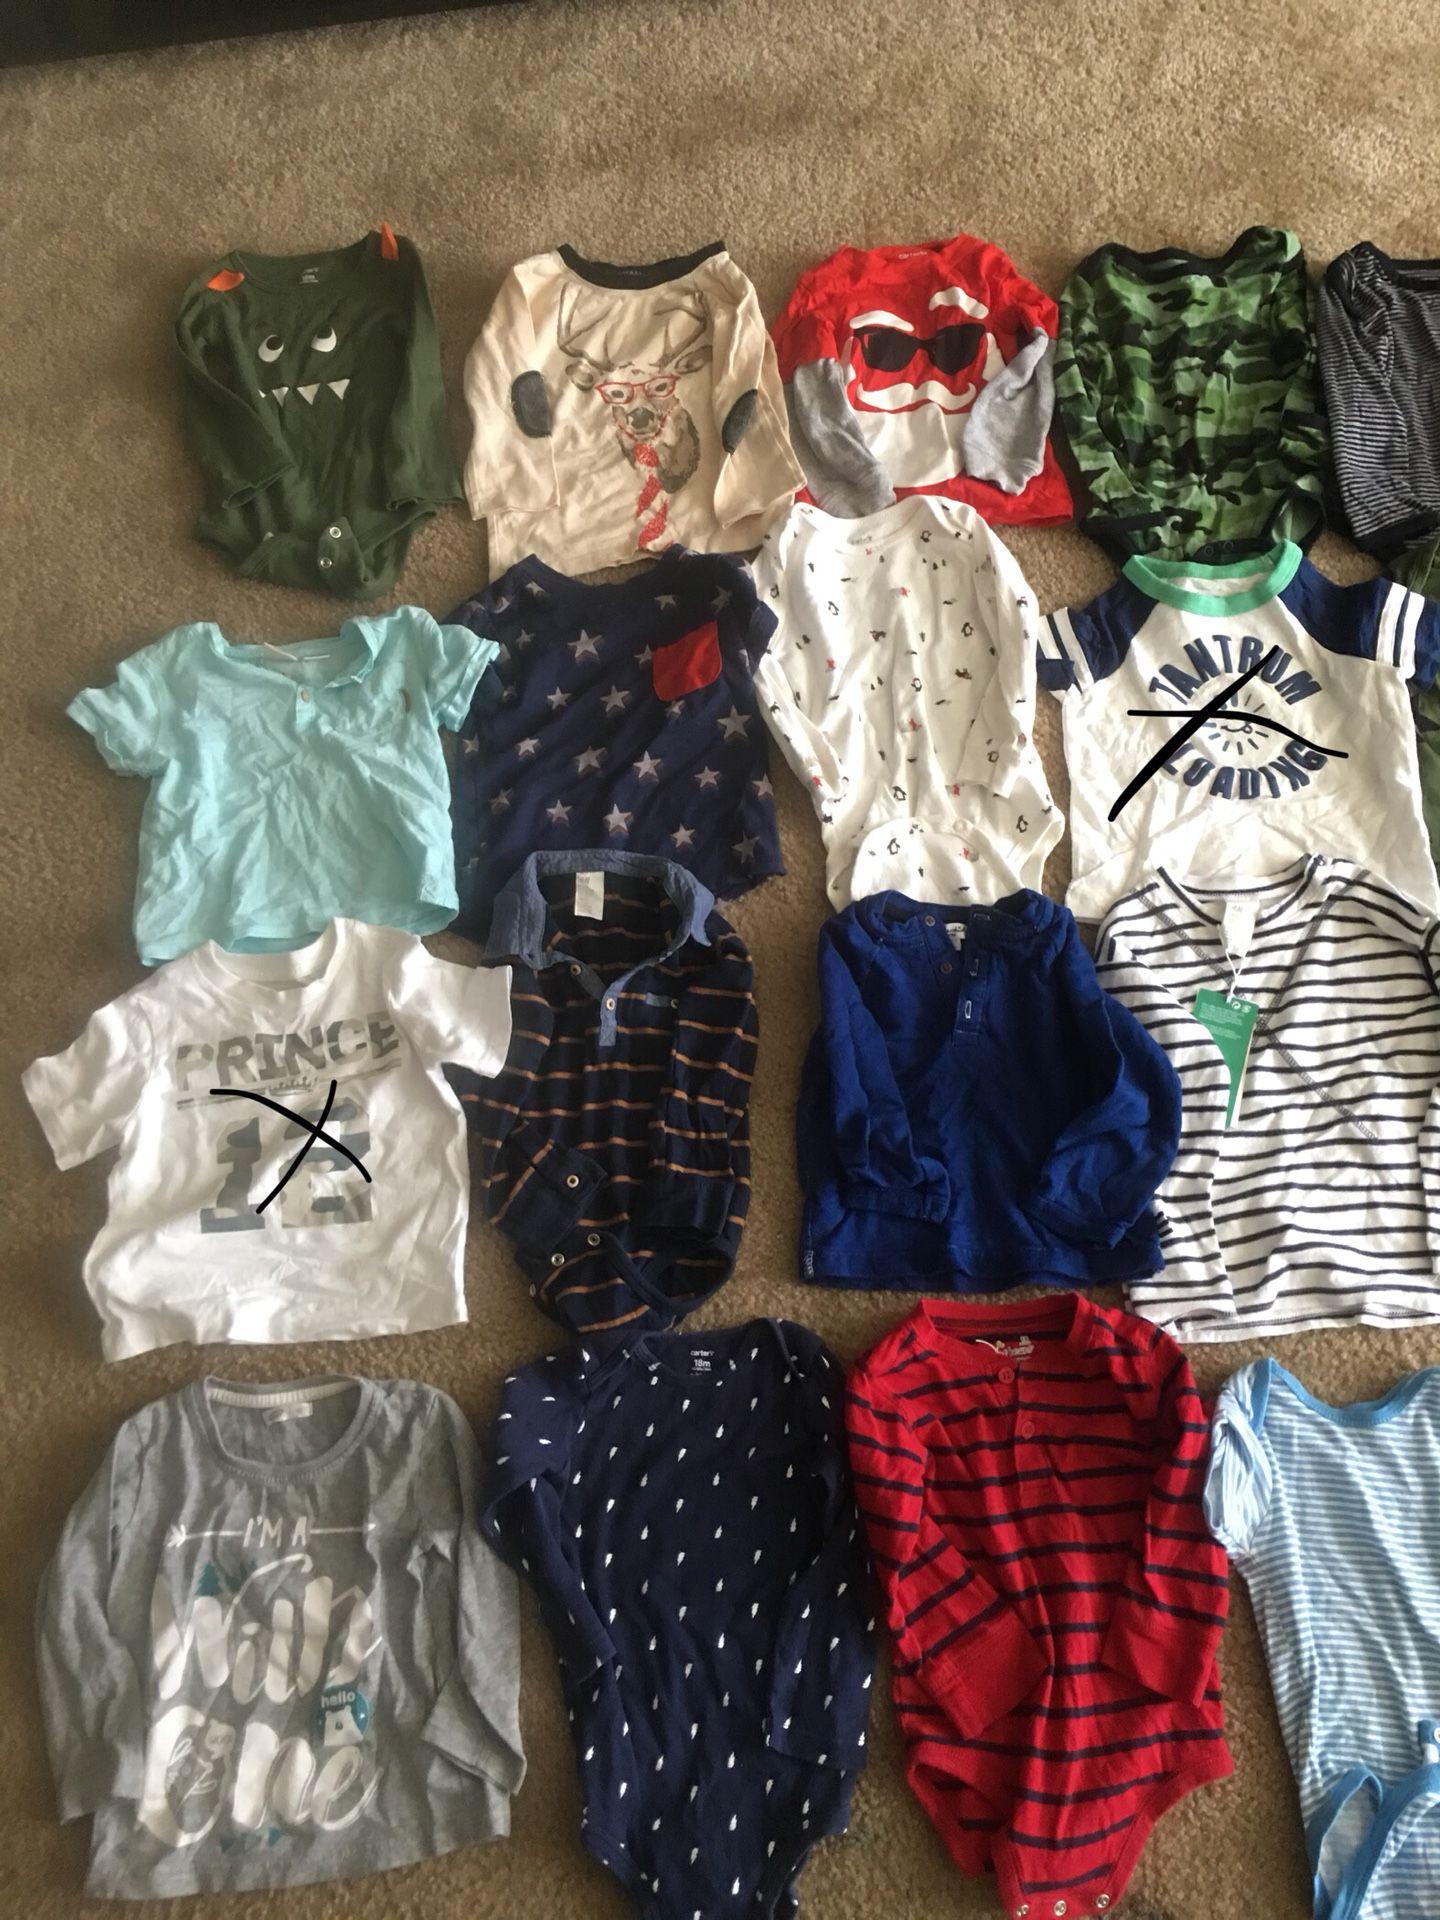 Baby boy/toddler 12-18 months shirts $2 each